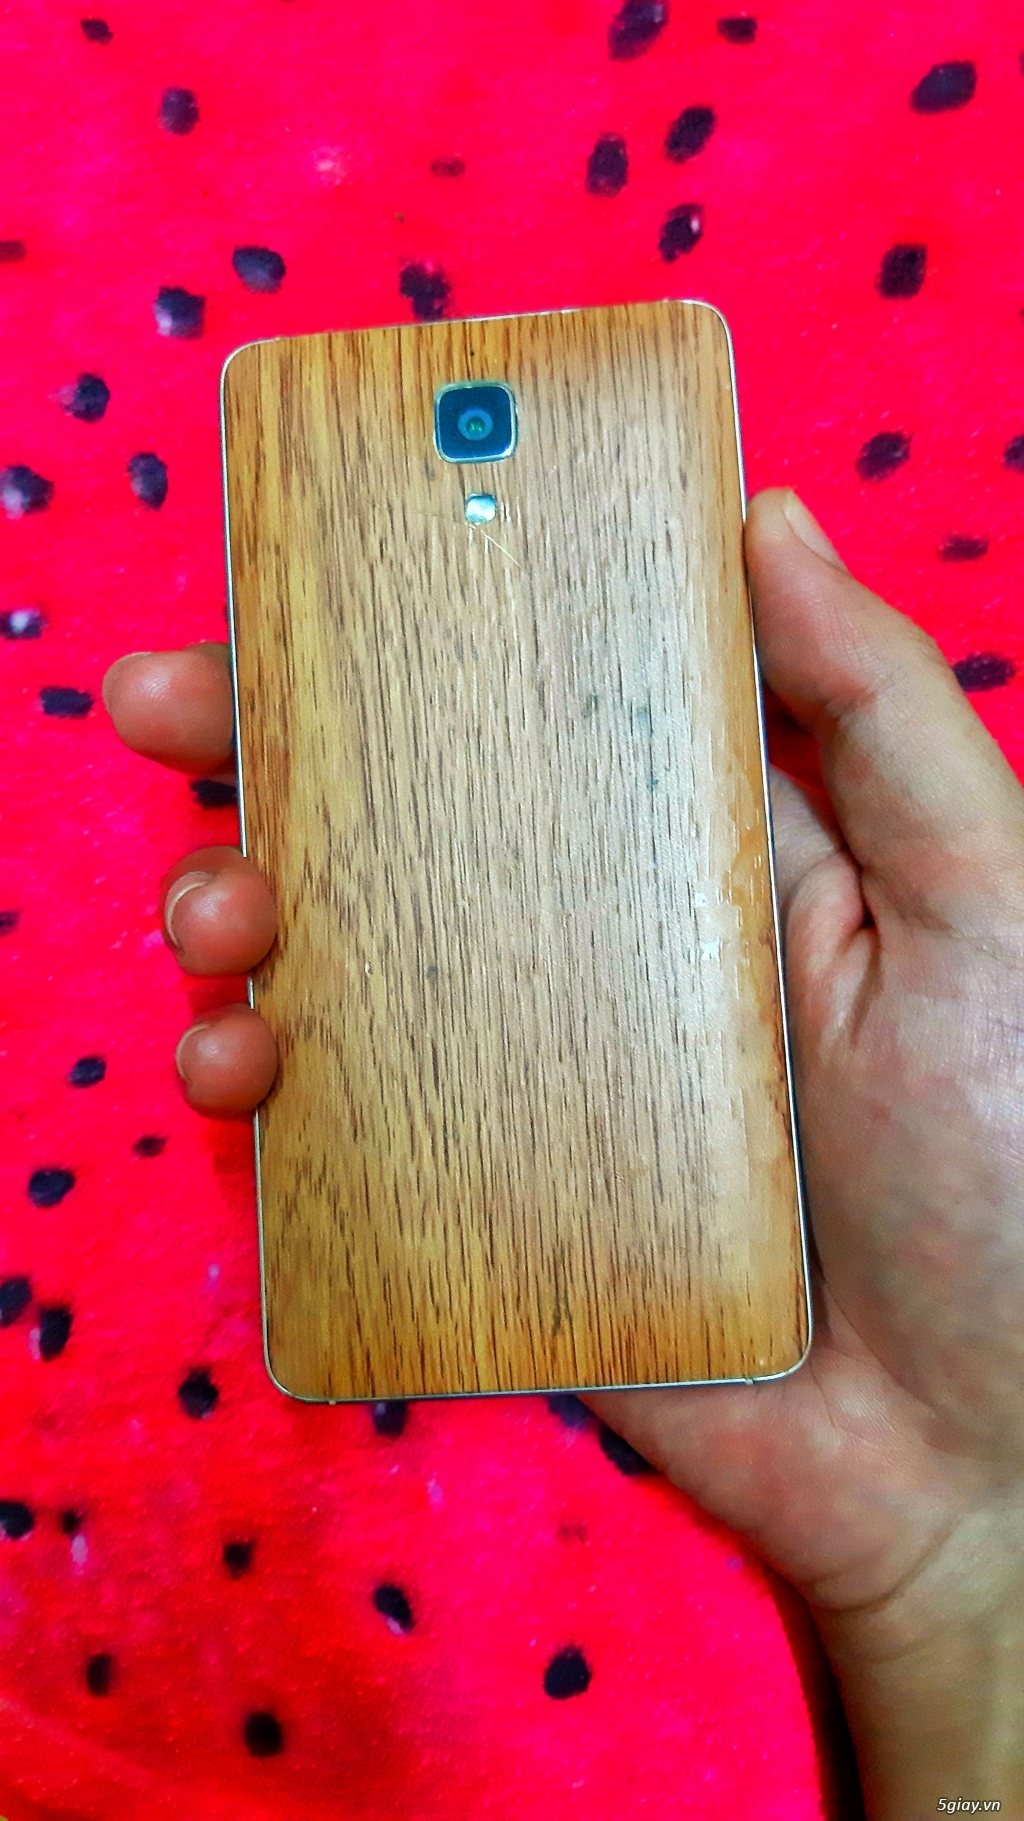 Xiaomi Mi 4 Trắng RAM 3GB, 16GB, Snapdragon 801 - 5